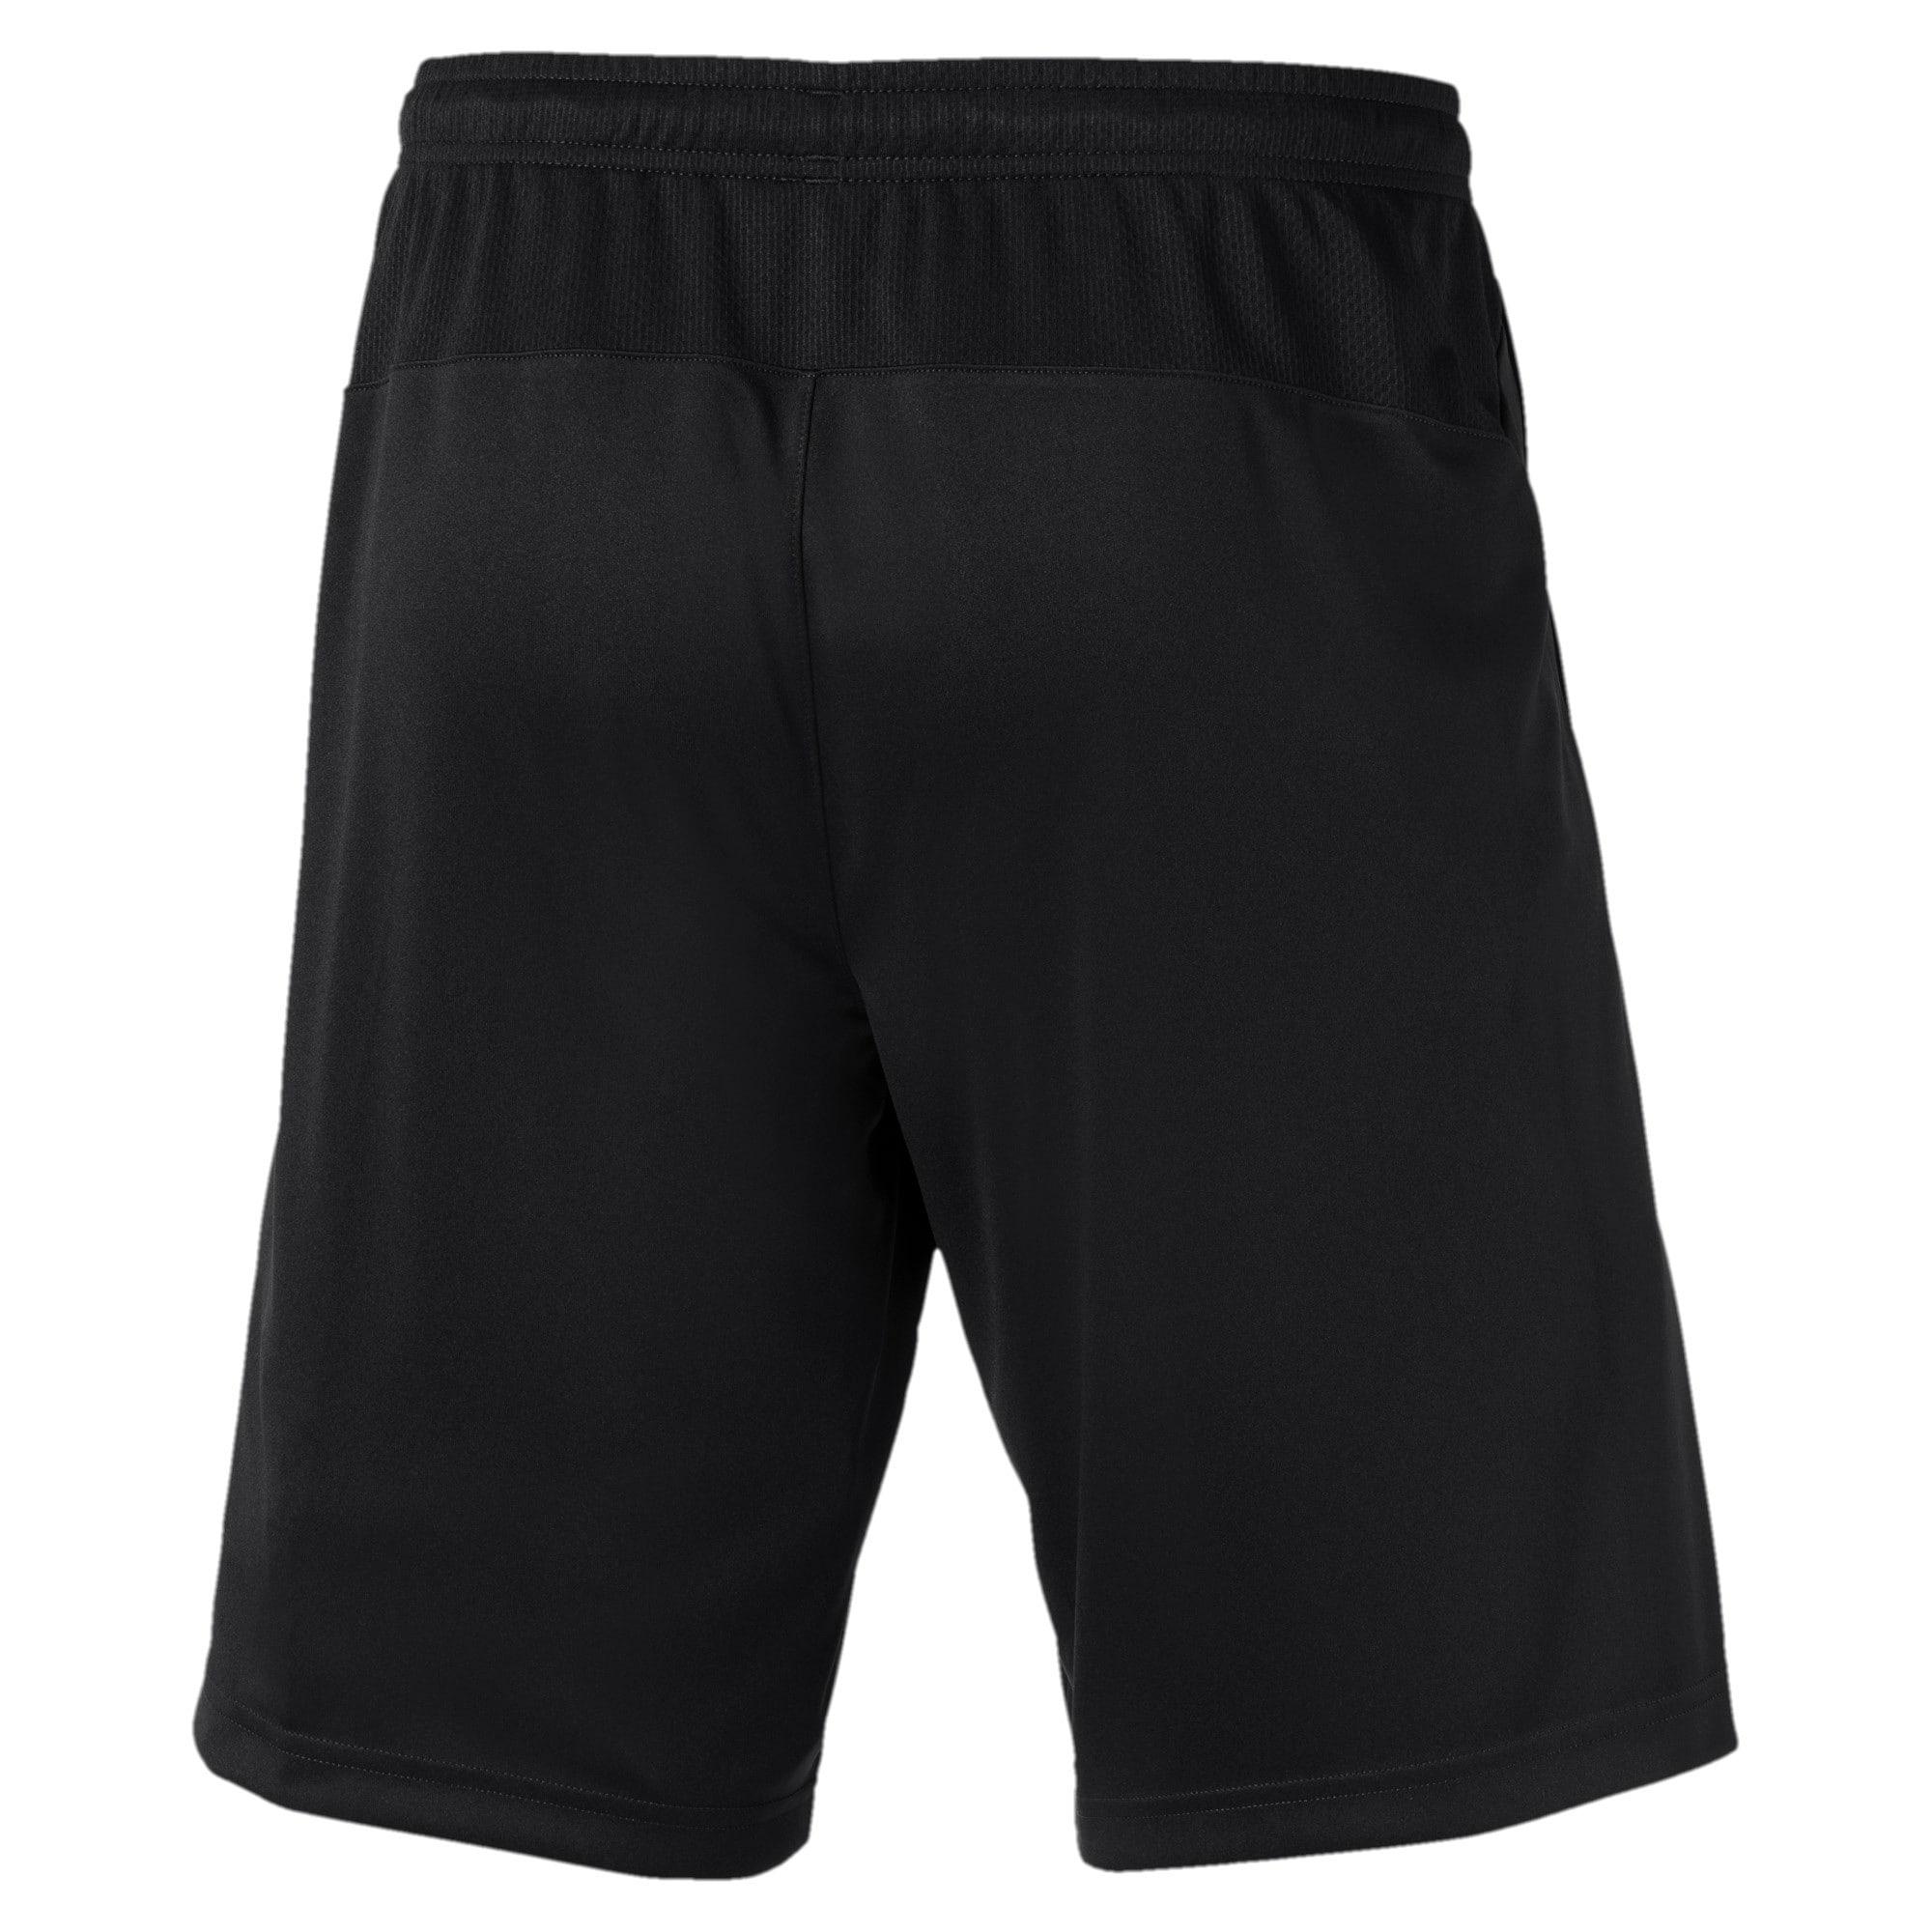 Thumbnail 2 of Valencia CF Men's Training Shorts, Puma Black-Puma White, medium